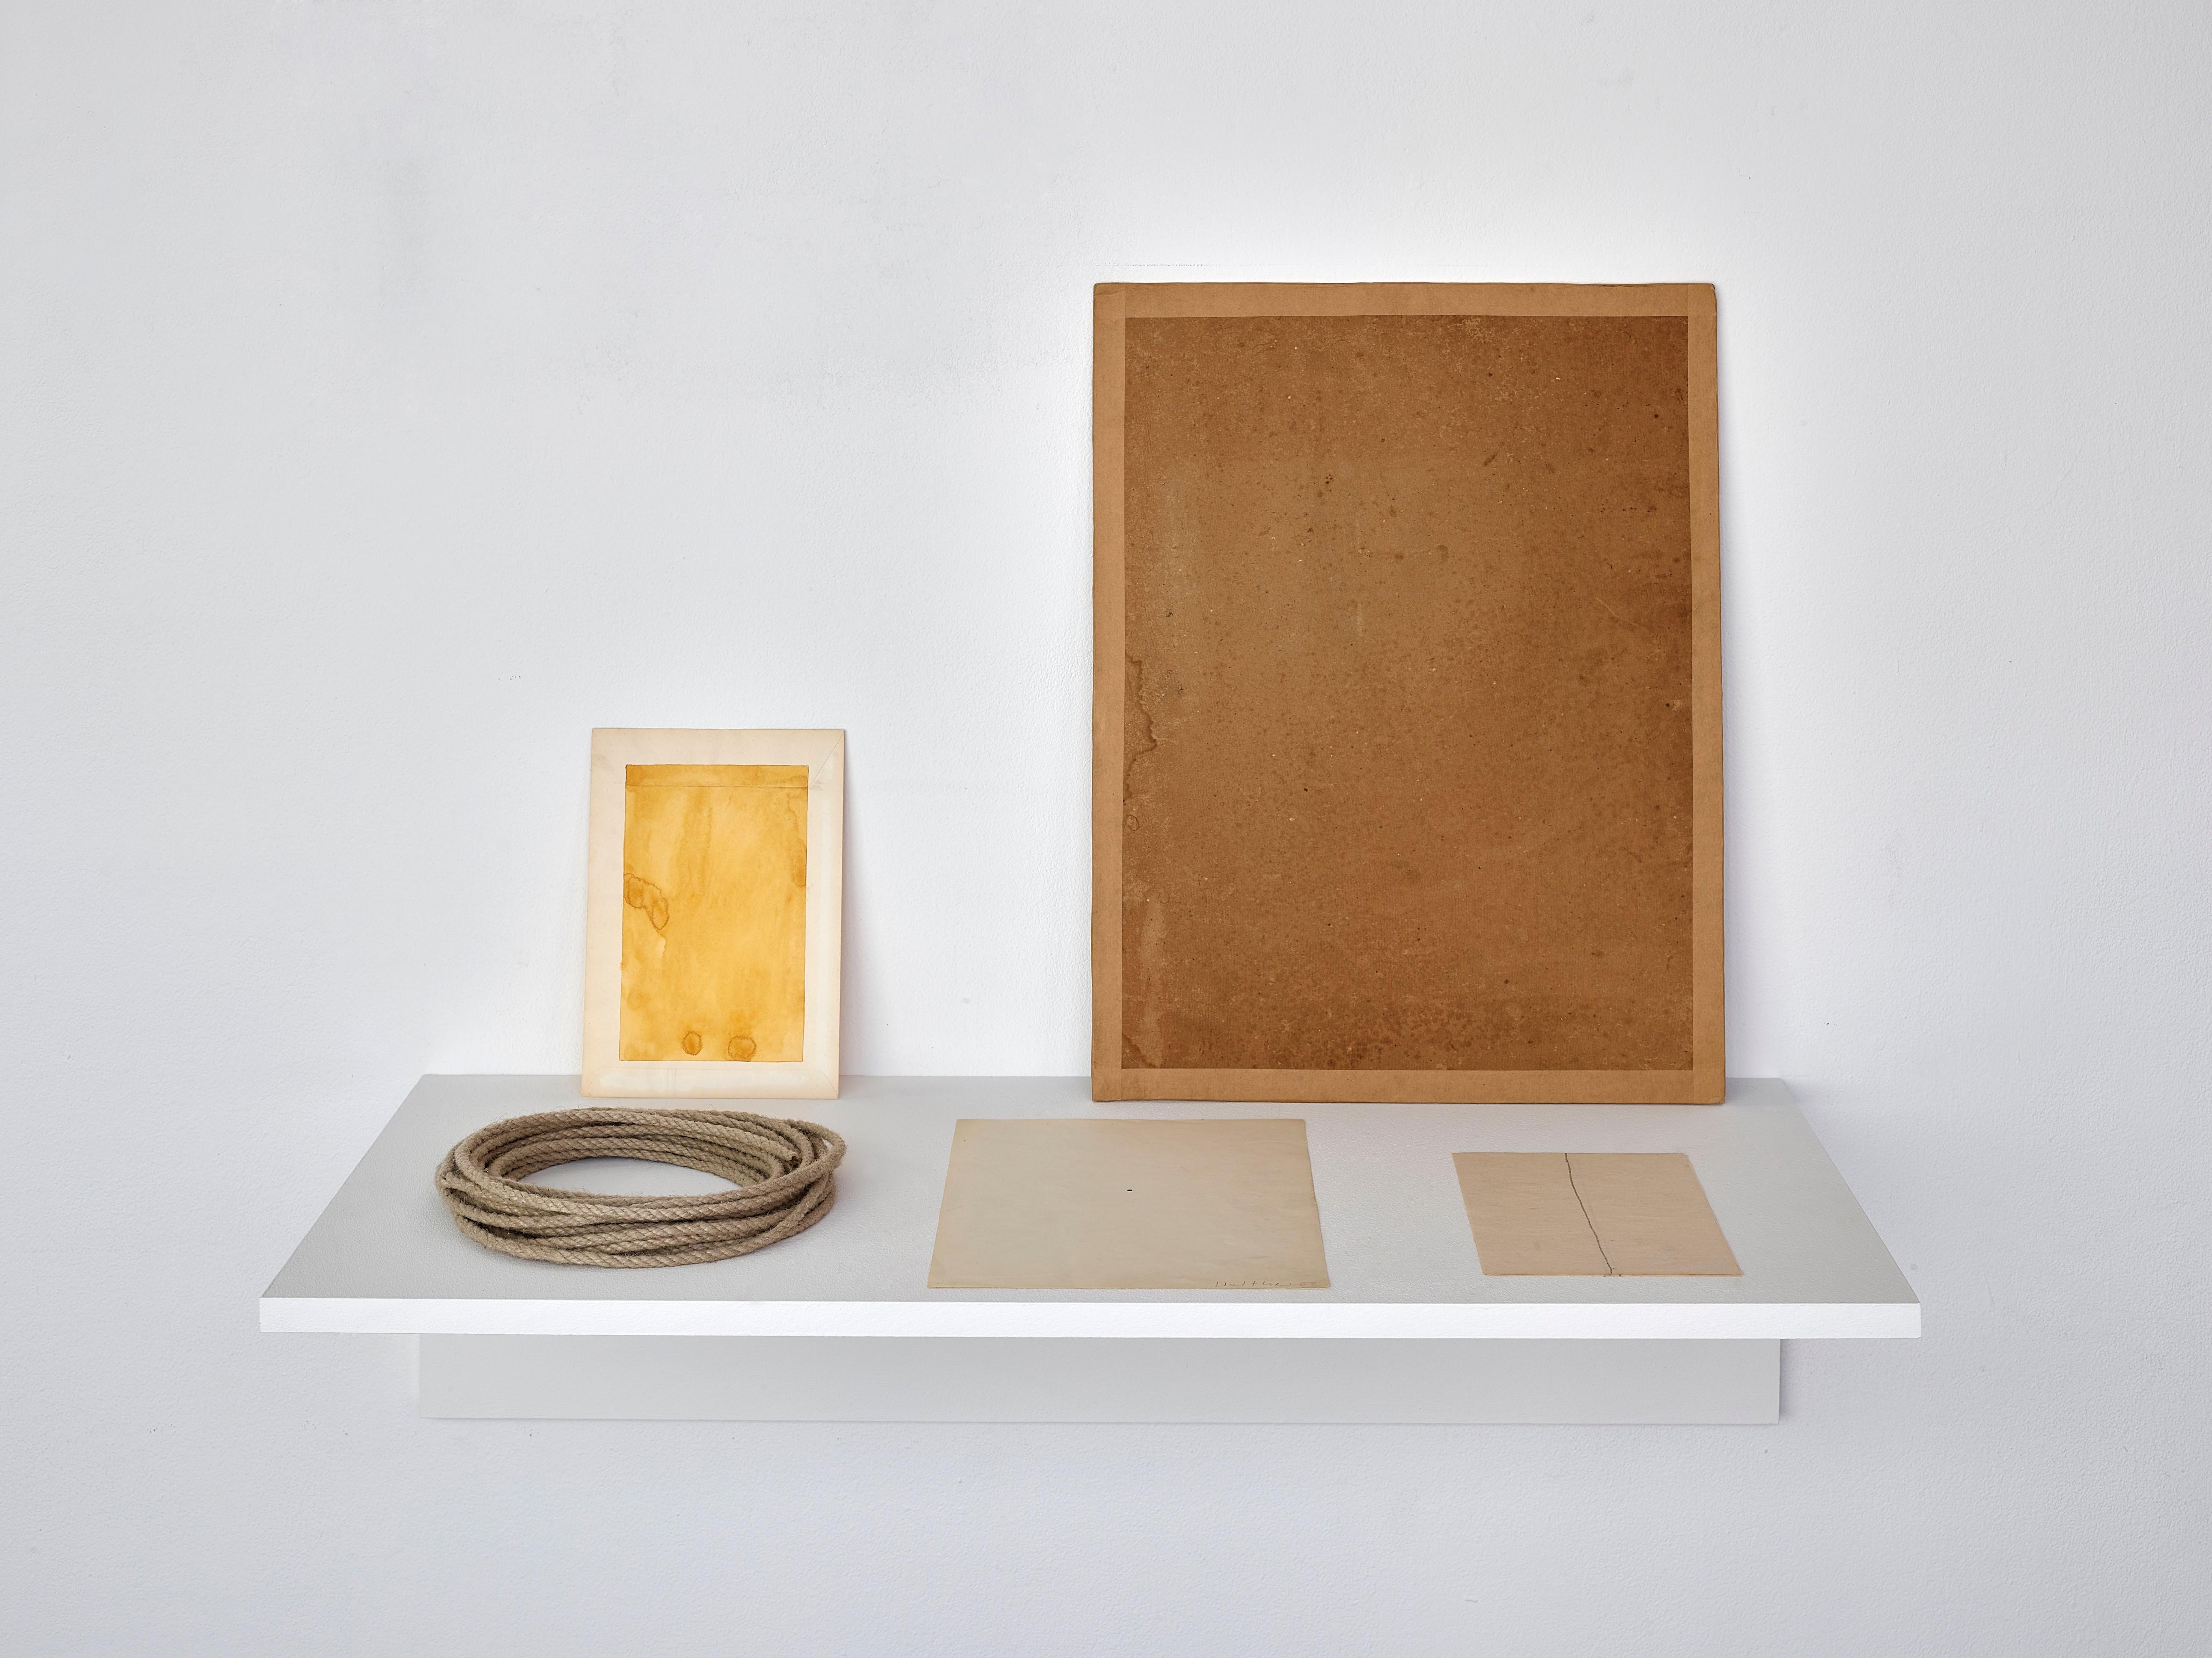 Franz Erhard Walther | Rahmenarbeit | Art Basel